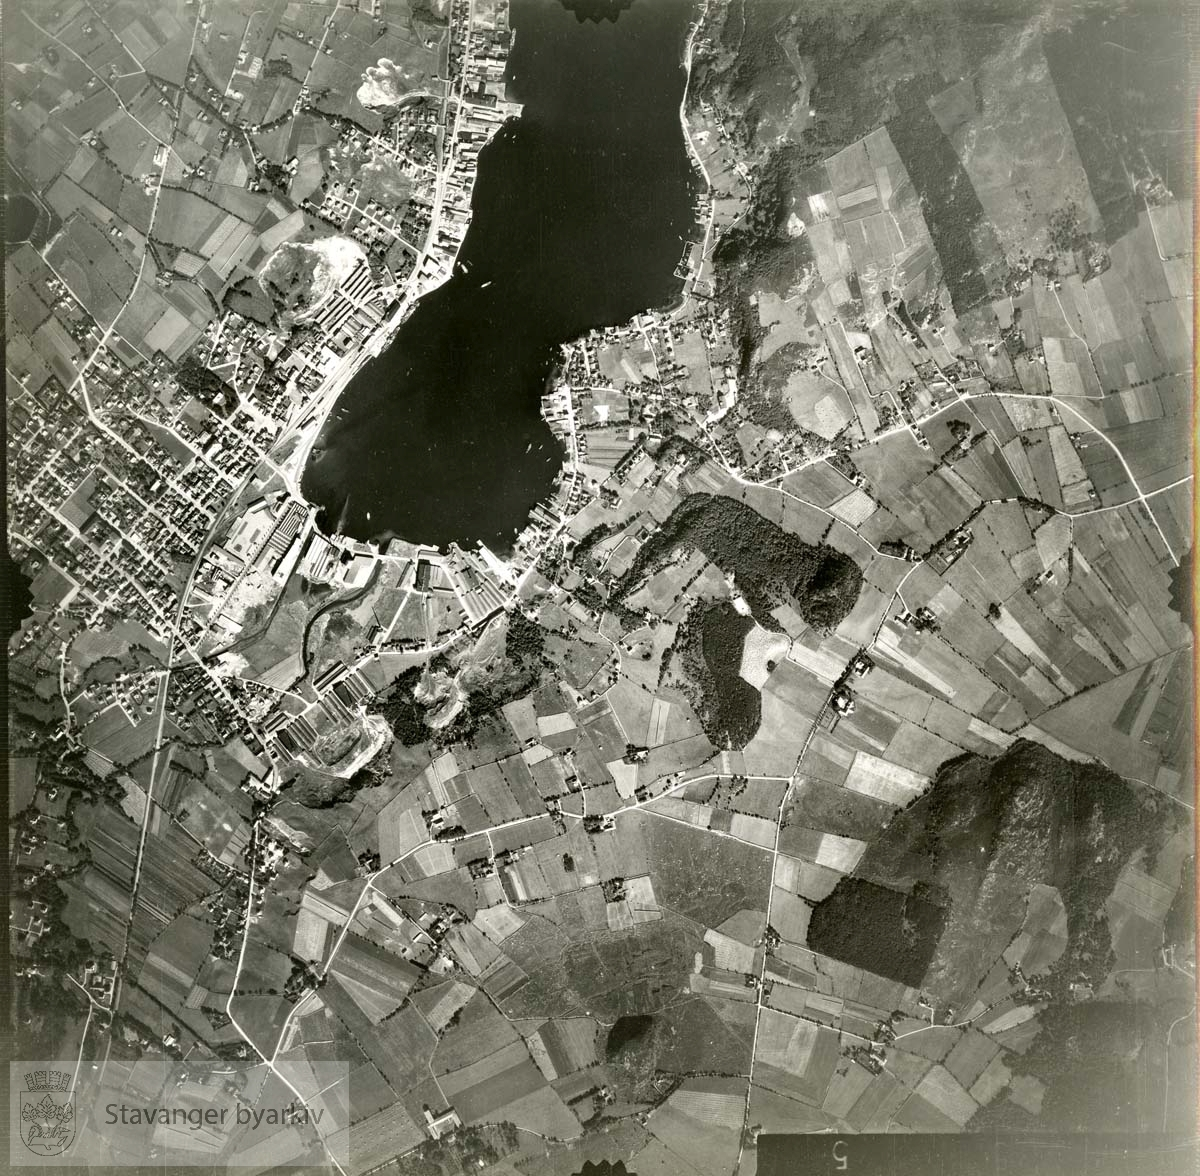 Jfr. kart/fotoplan F14/555..Austrått, Trones, sentrum, Lura, Gandsfjorden..Se ByStW_Uca_002 (kan lastes ned under fanen for kart på Stavangerbilder)